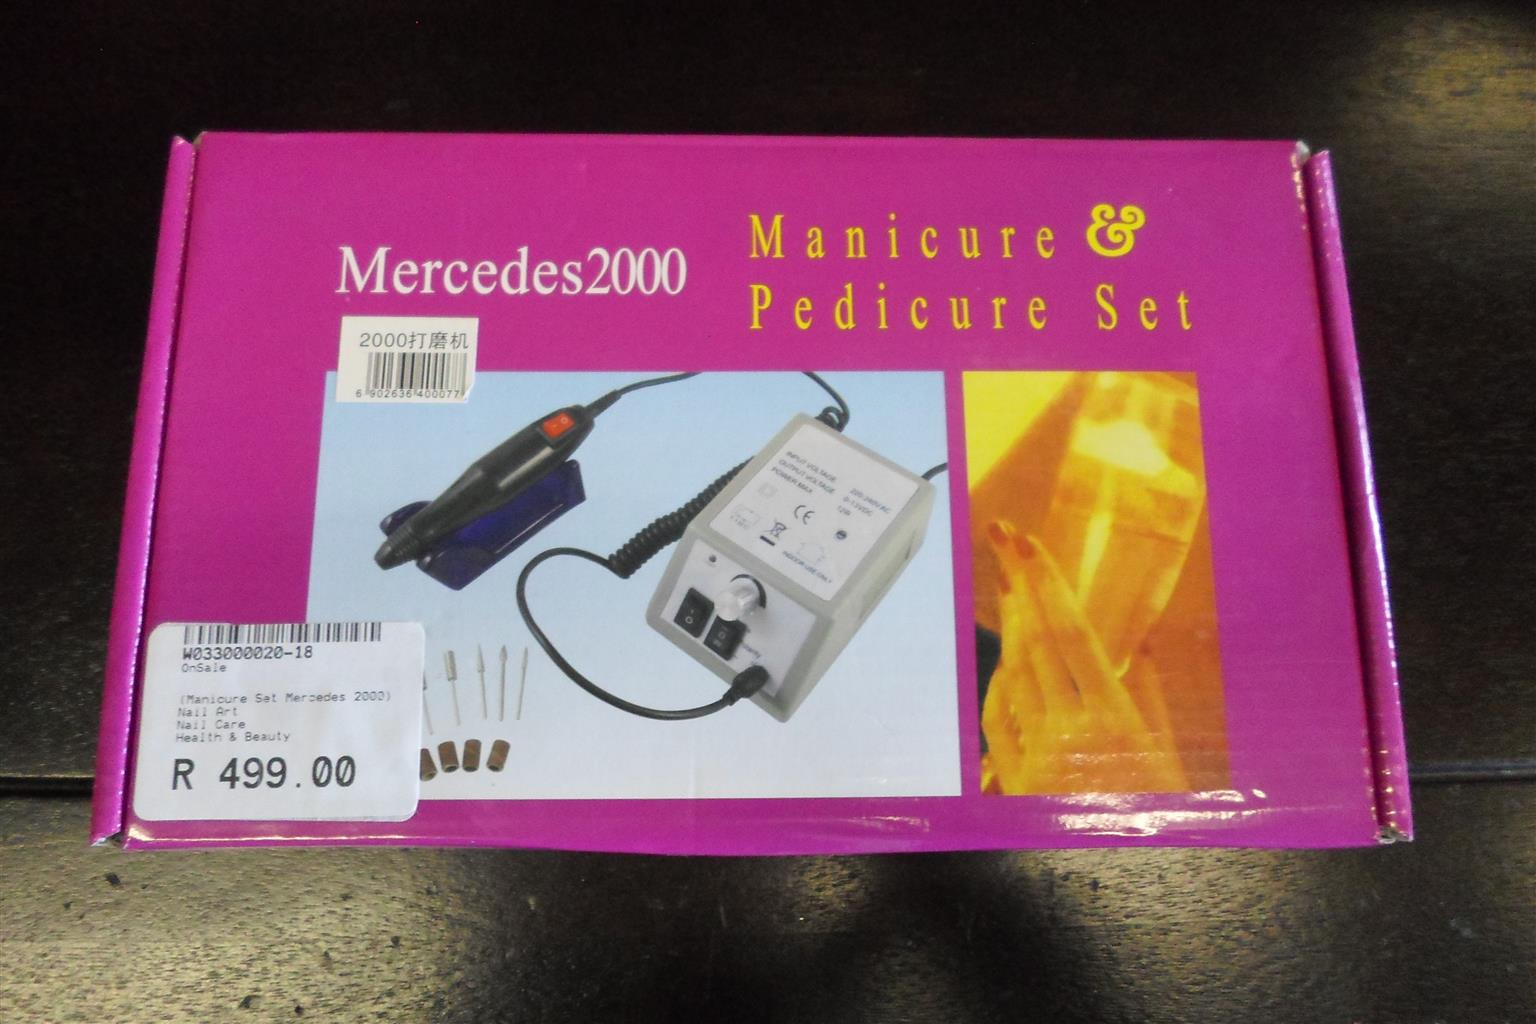 Mercedes 2000 Manicure/Pedicure Set